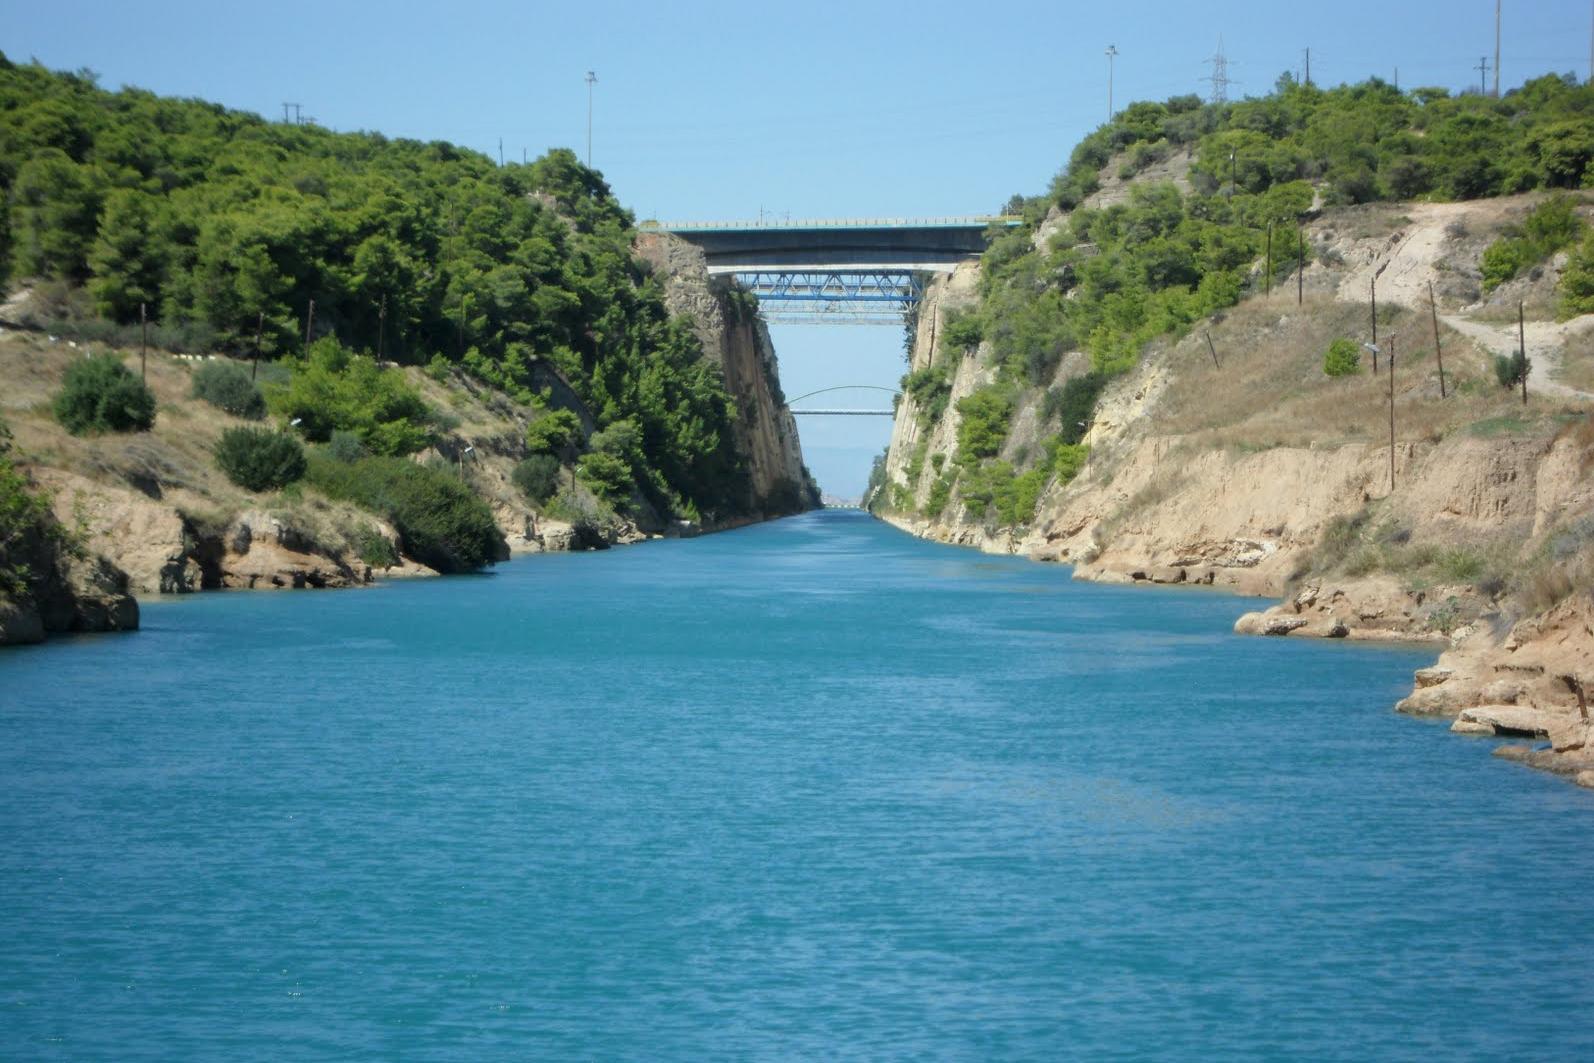 Canalul Corint